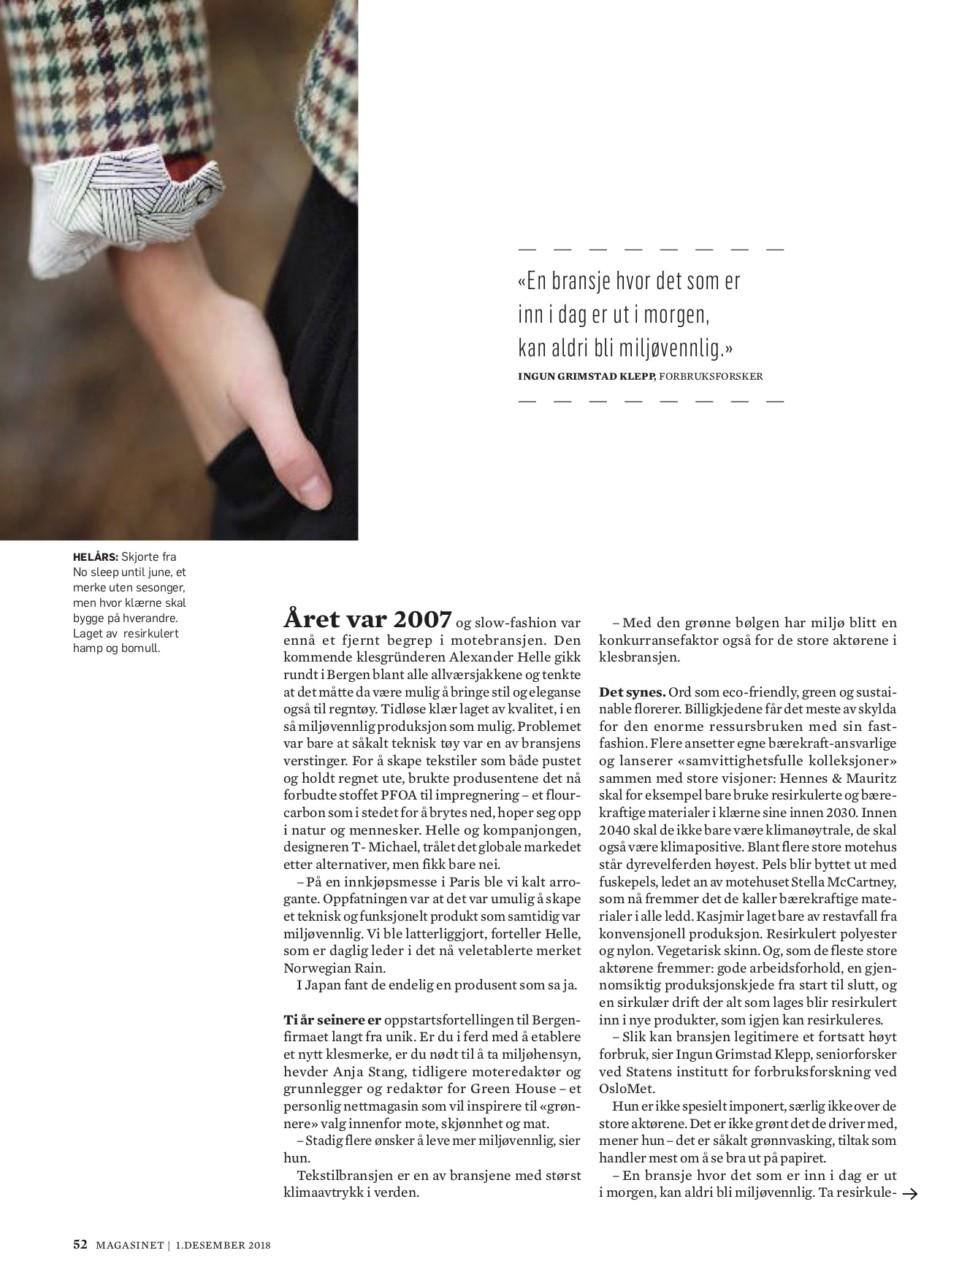 dagbladet-magasinet-miljovennlig-mote